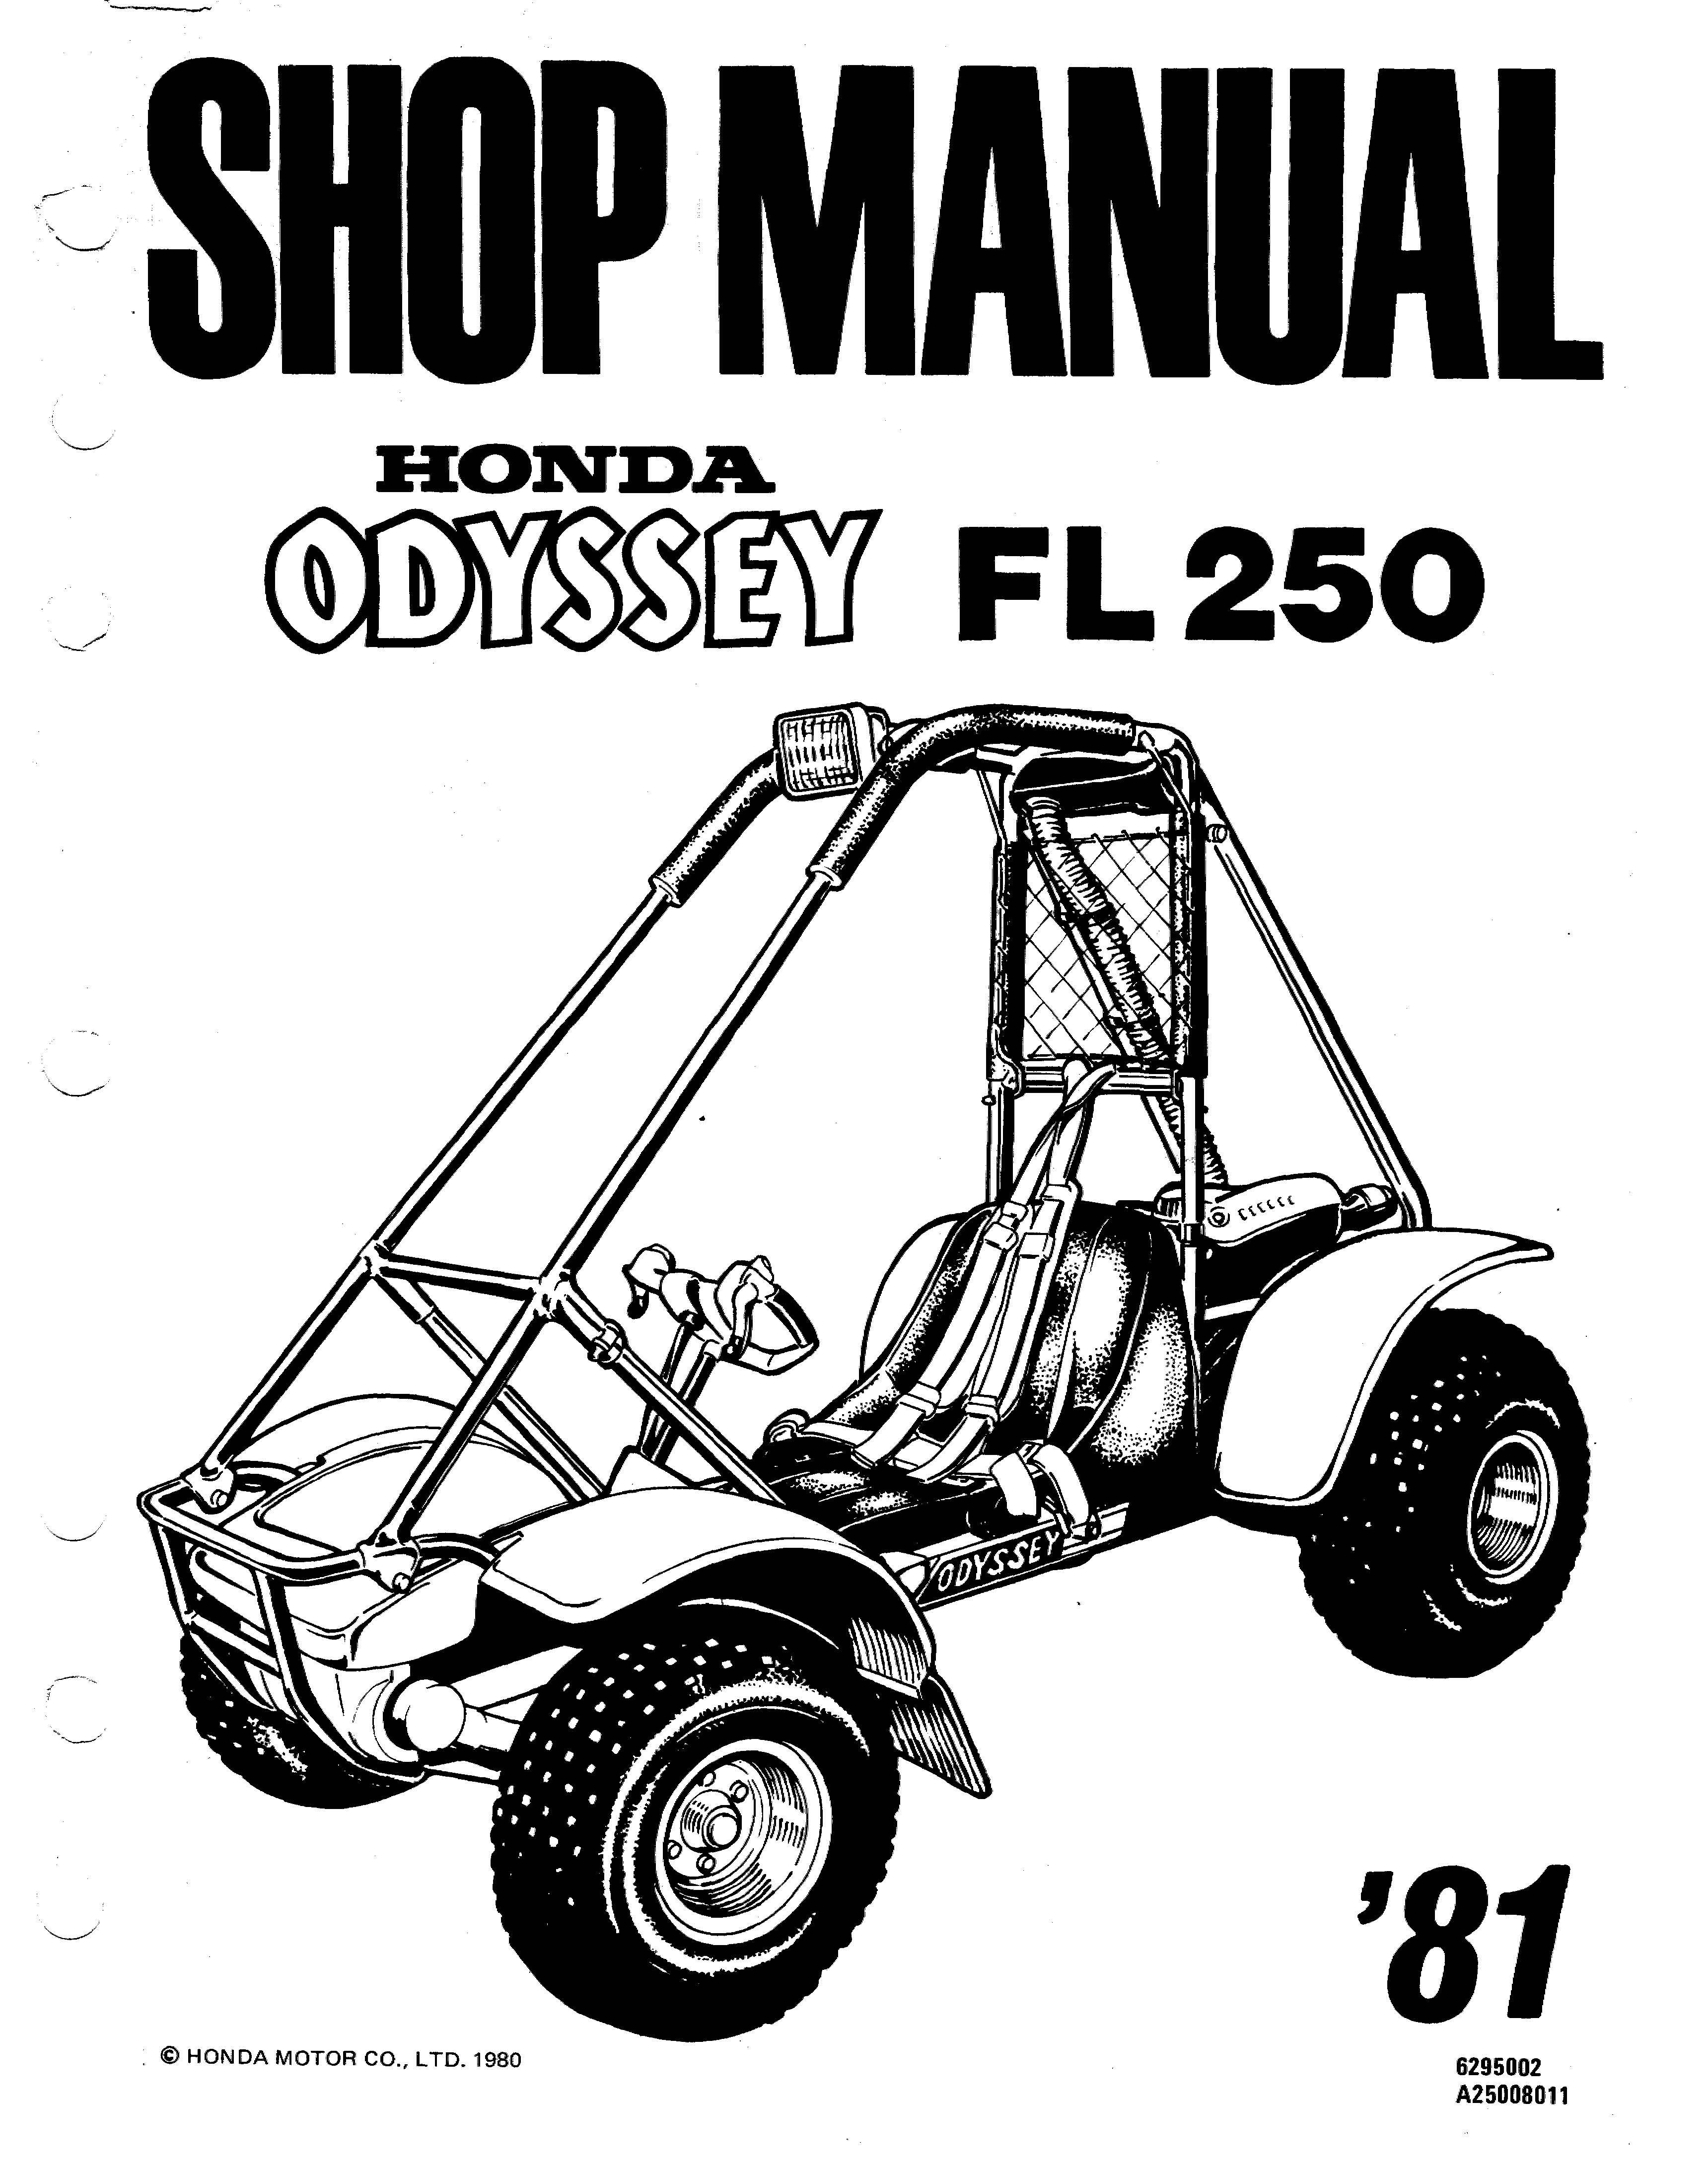 Workshopmanual for Honda FL250 Odyssey (1981)